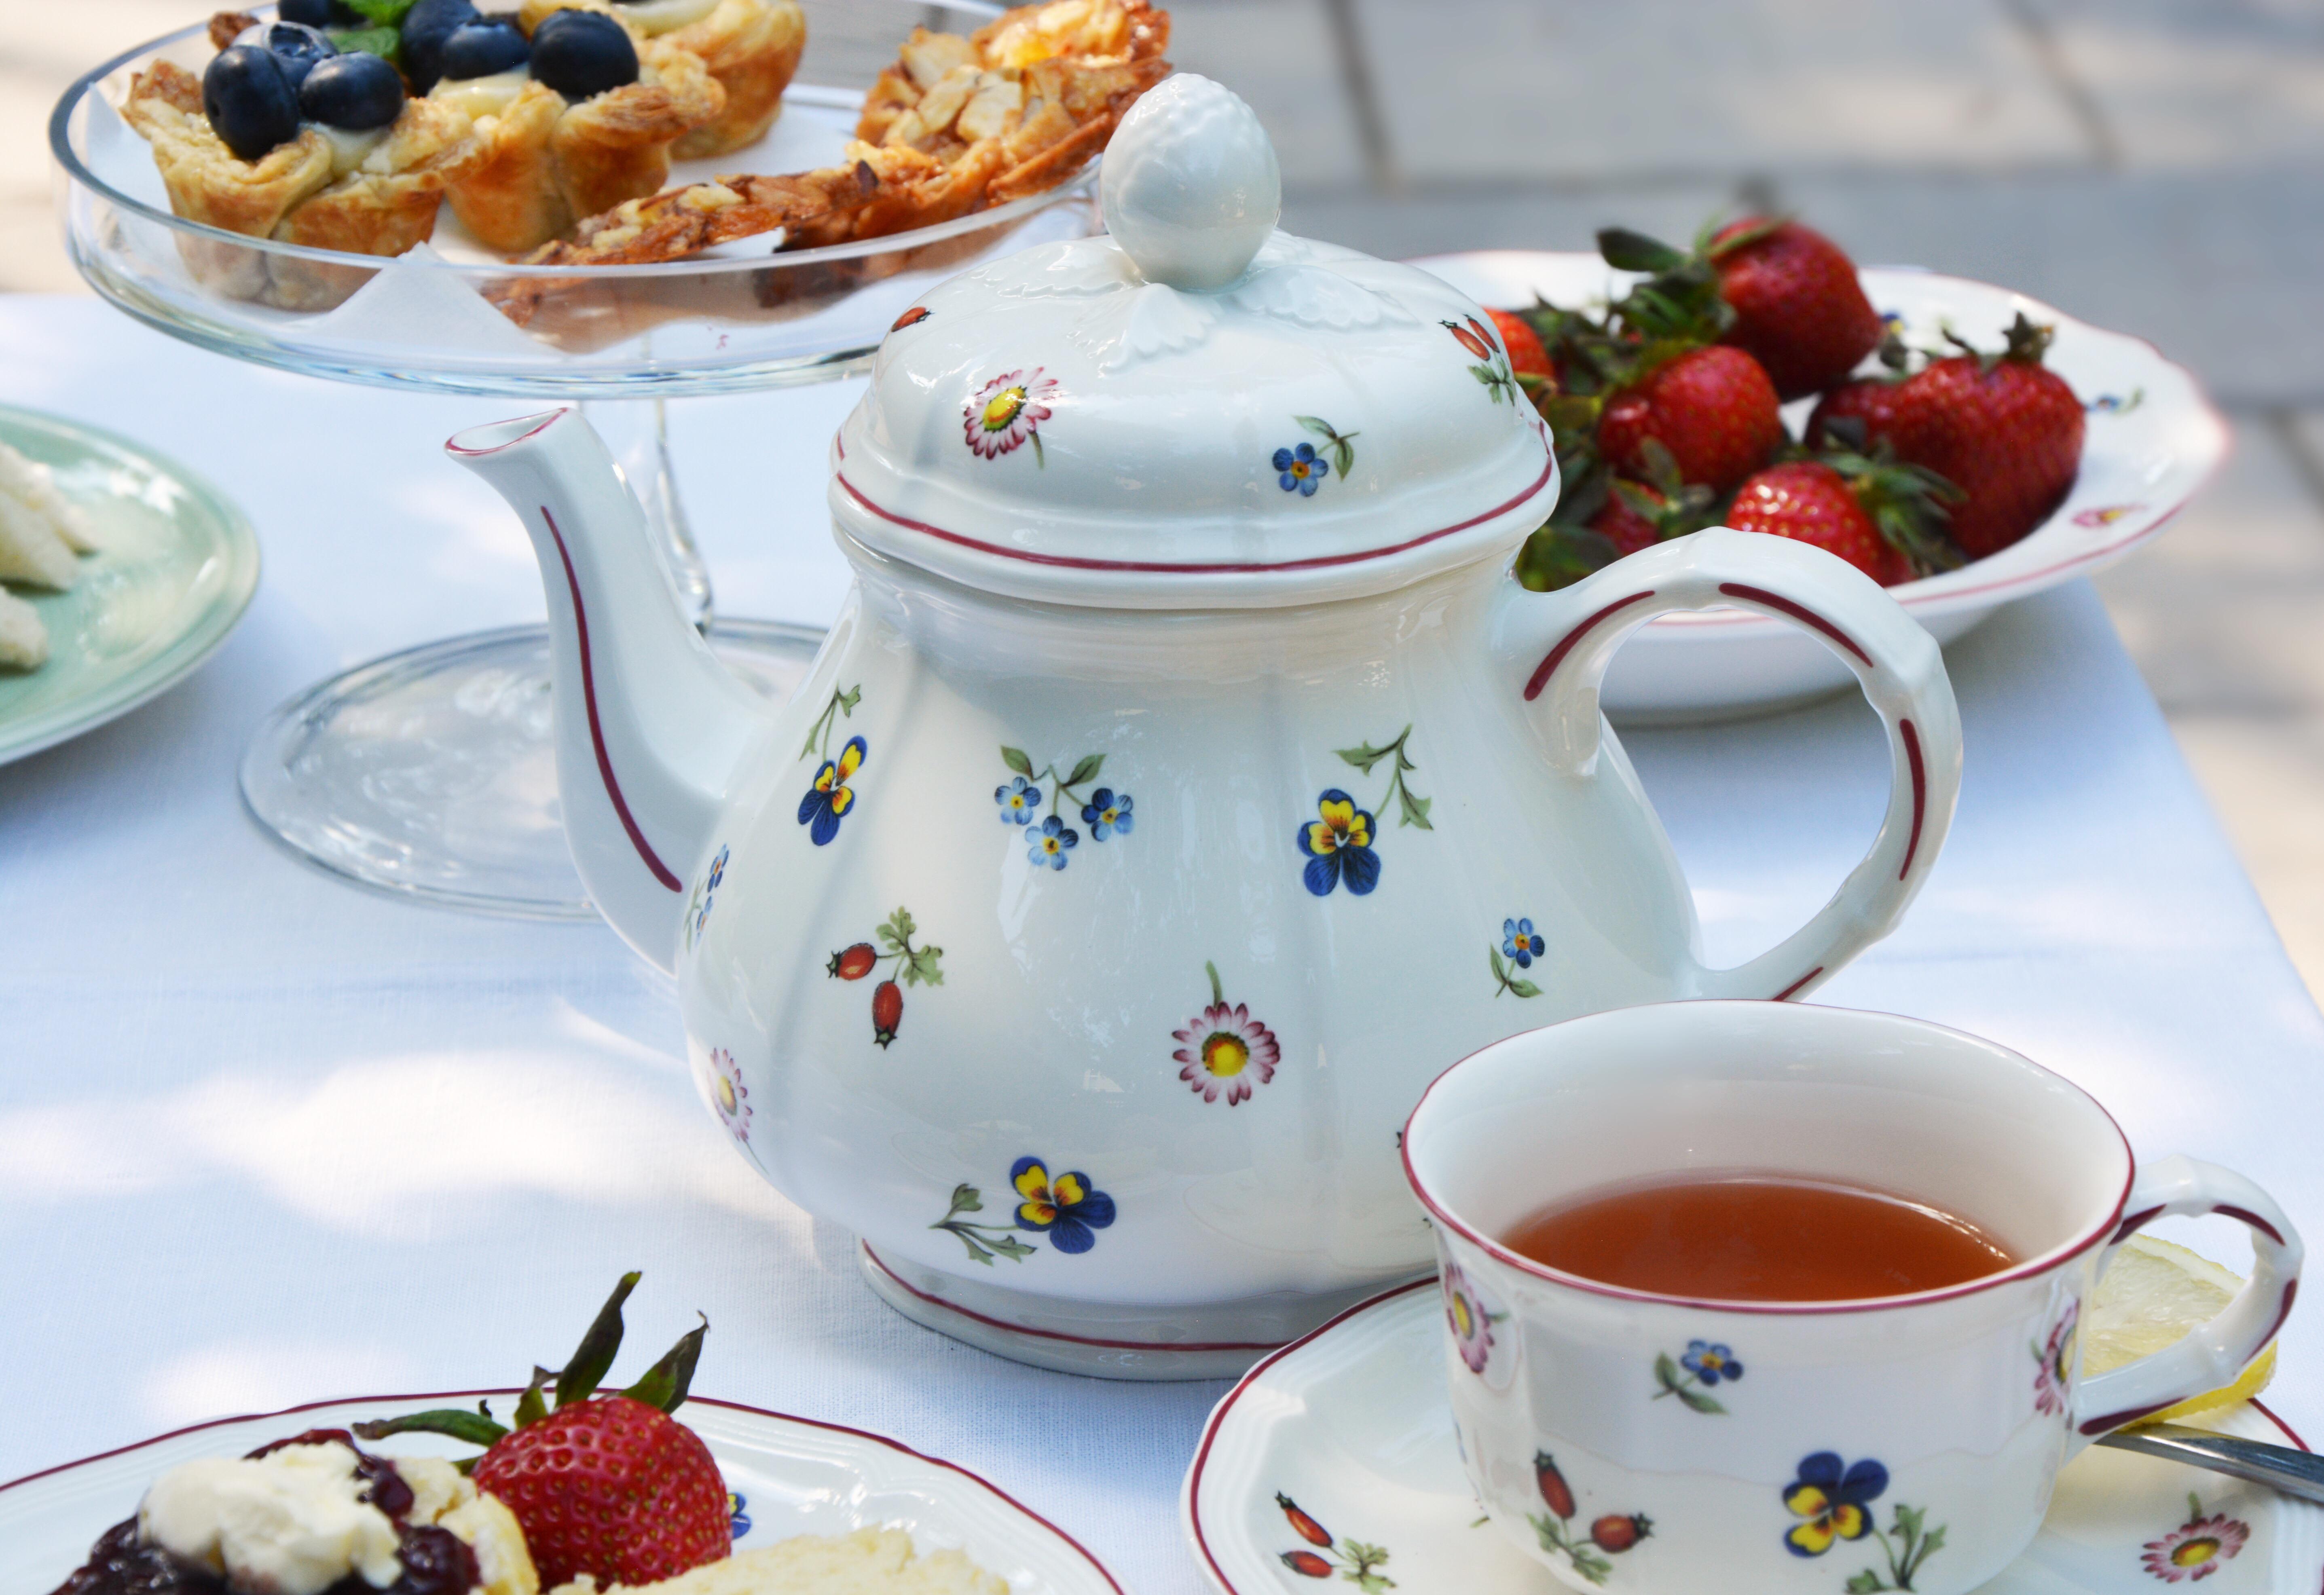 Petite Fleur teapot and teacup